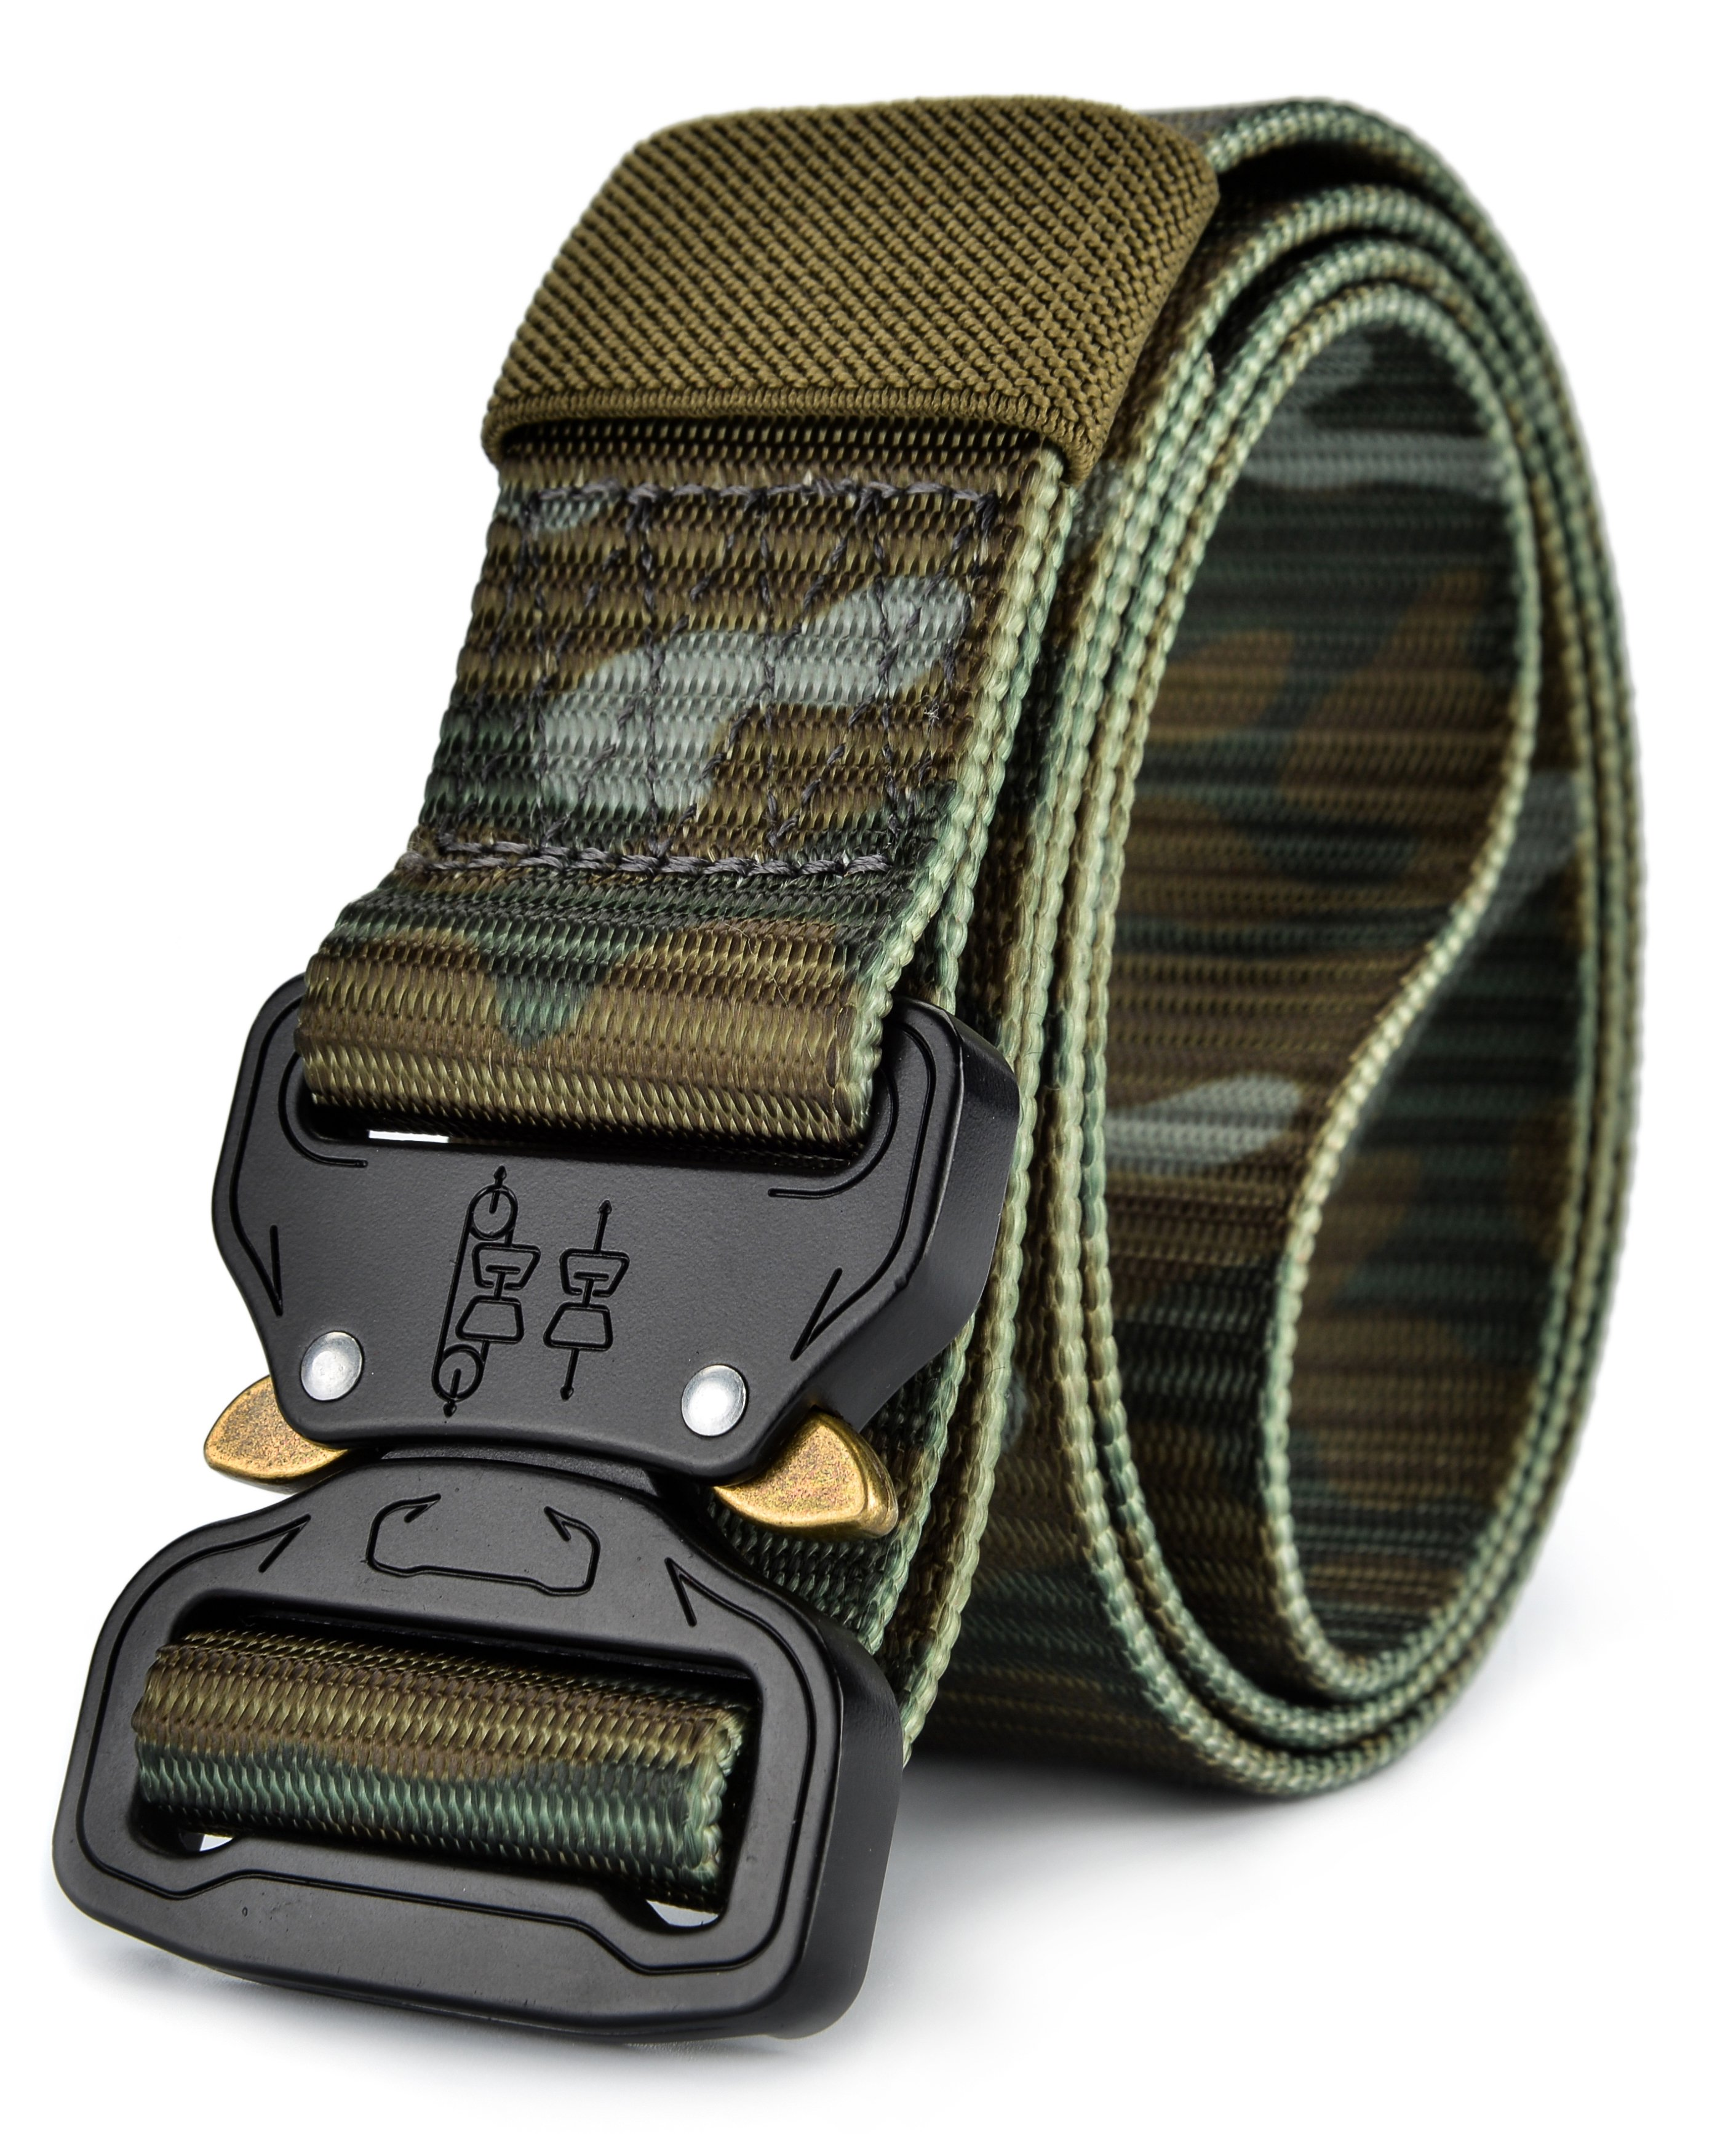 Men/'s Tactical Military Heavy Duty Nylon Quick Release Rigger/'s Webbed Belt